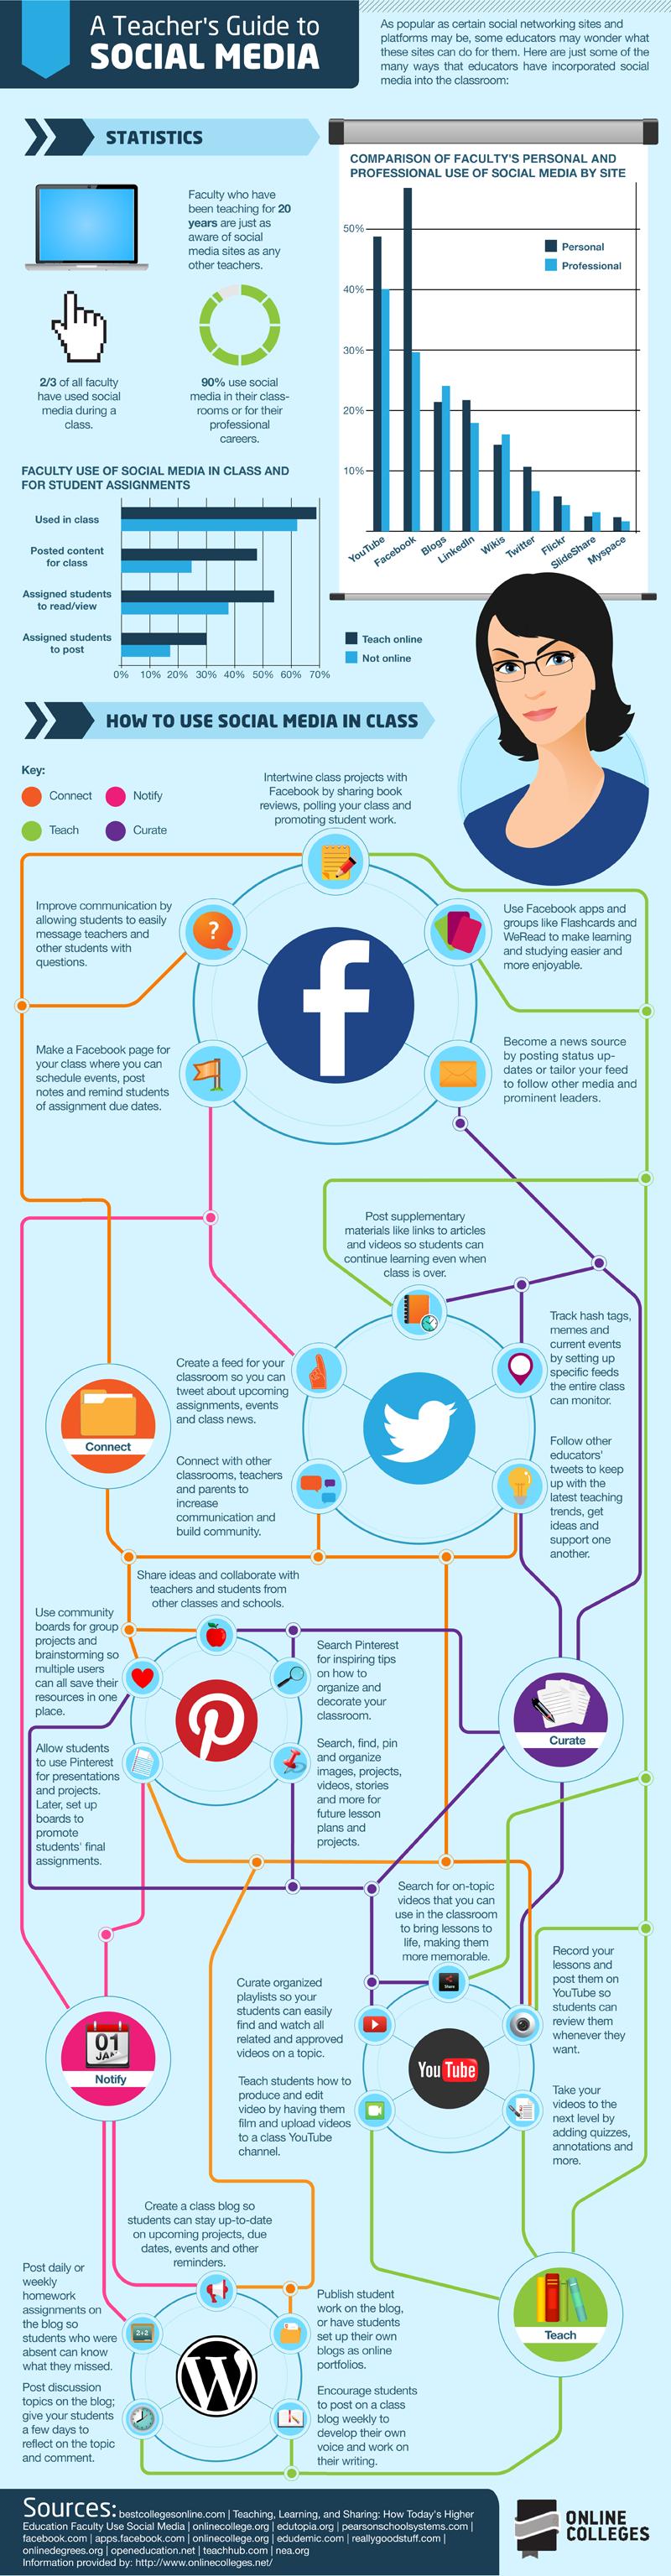 A Teacher's Guide to Social Media #social #socialmedia #infographic